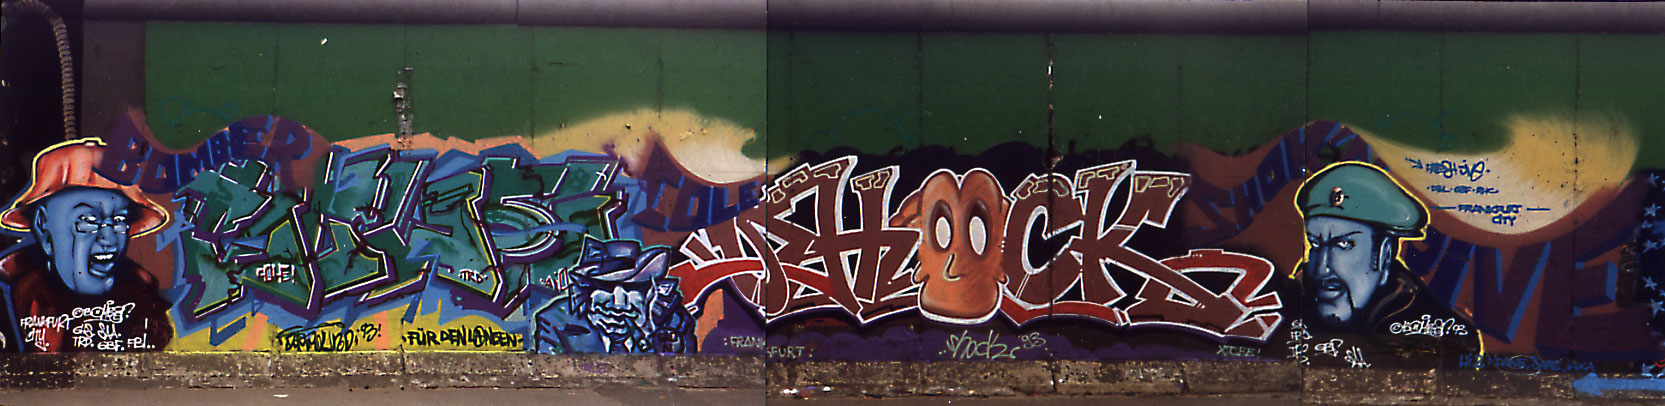 Graffiti Eastside Gallery 1993